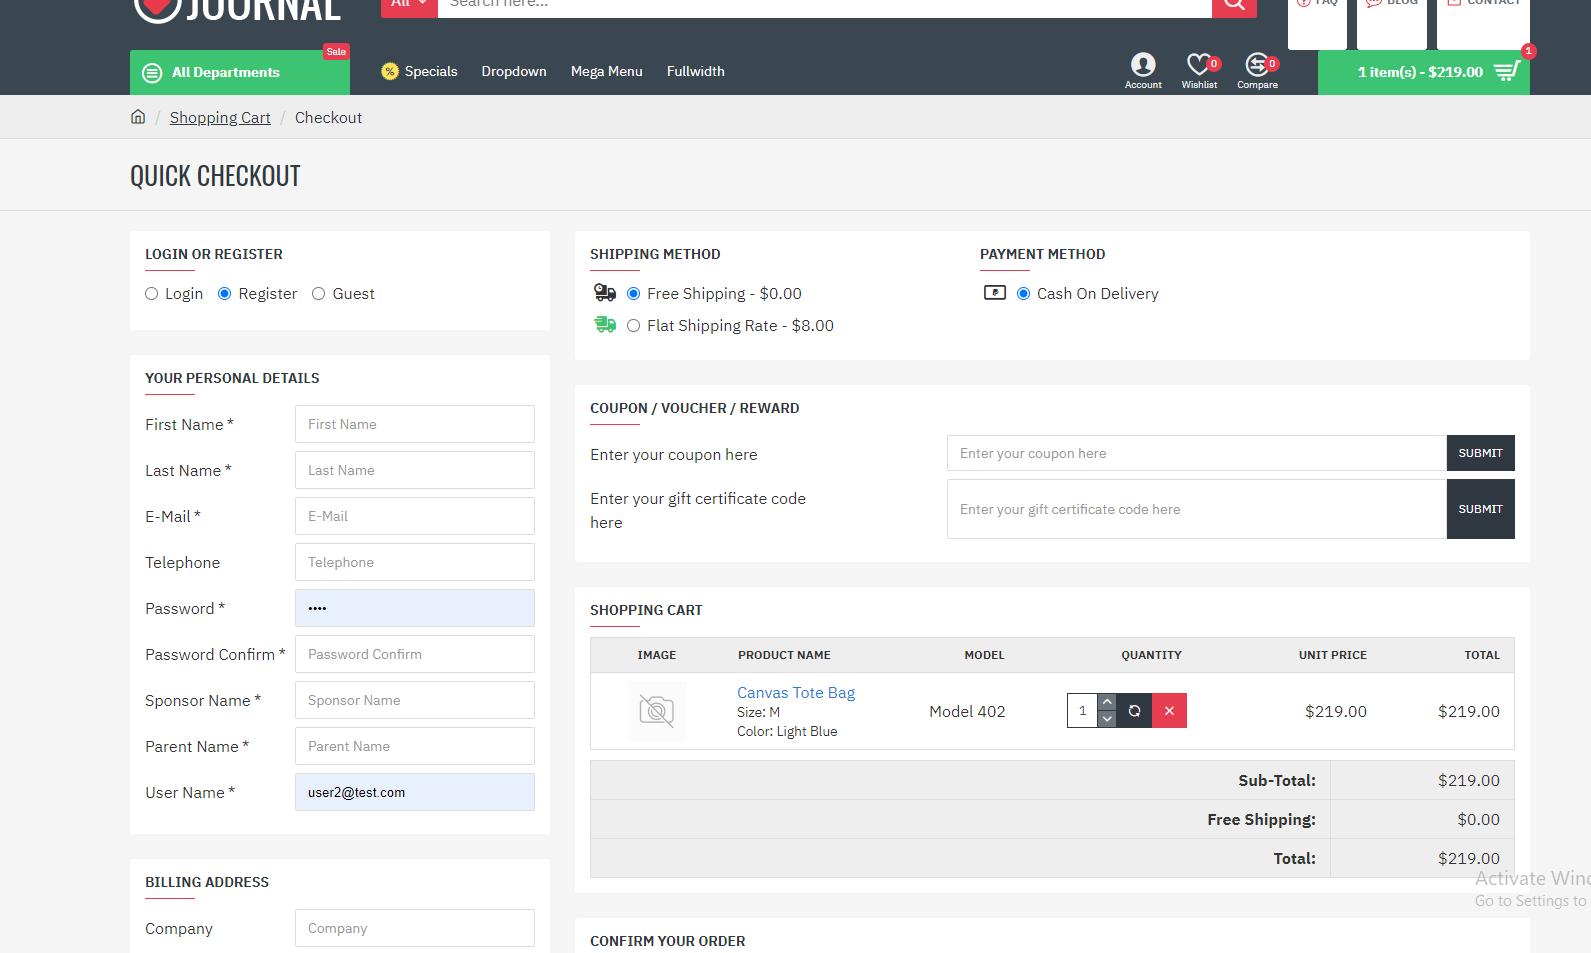 |'Opencart'| |'letscms'| |'opencart unilevel mlm plan'| |'journal'| |'journal checkout registration'| |'dashboard'| |'Dashboard'| |'unilevel mlm plan'| |'mlm'| |'checkout'| |'mlm Plan'|  |'registration'| |'new users'| |'unilevel'| |'unilevel mlm extension'| |'costomer list'| |'new users'| |'Installer'| |'mlmtrees.com'| |'mlm plan'| |'extension'| |'Opencart mlm plan'|